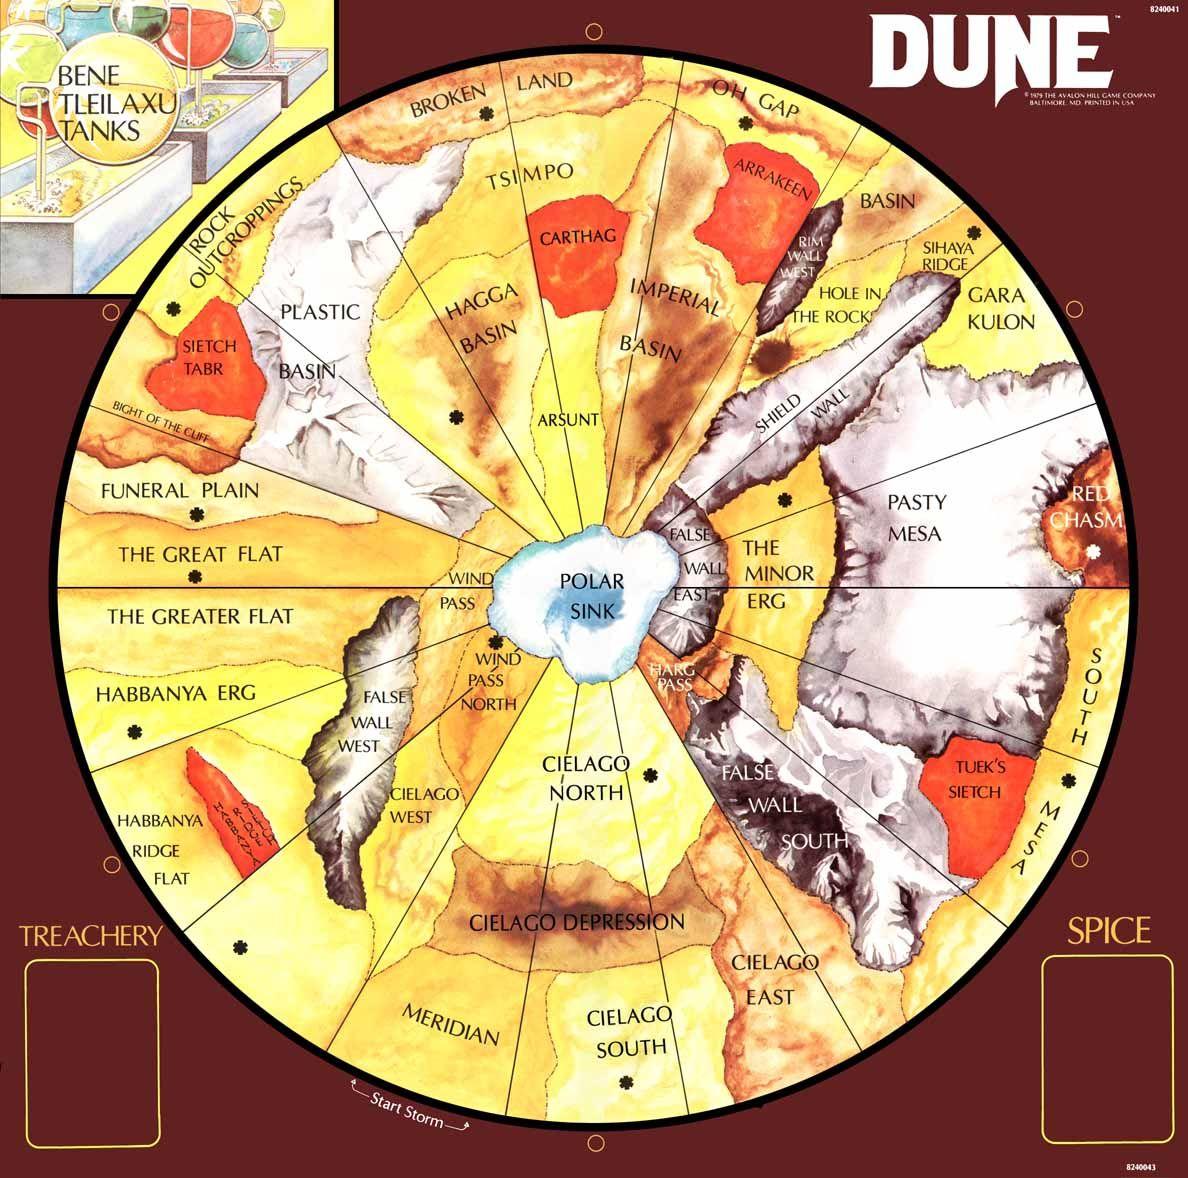 dune caladan planet map - photo #23